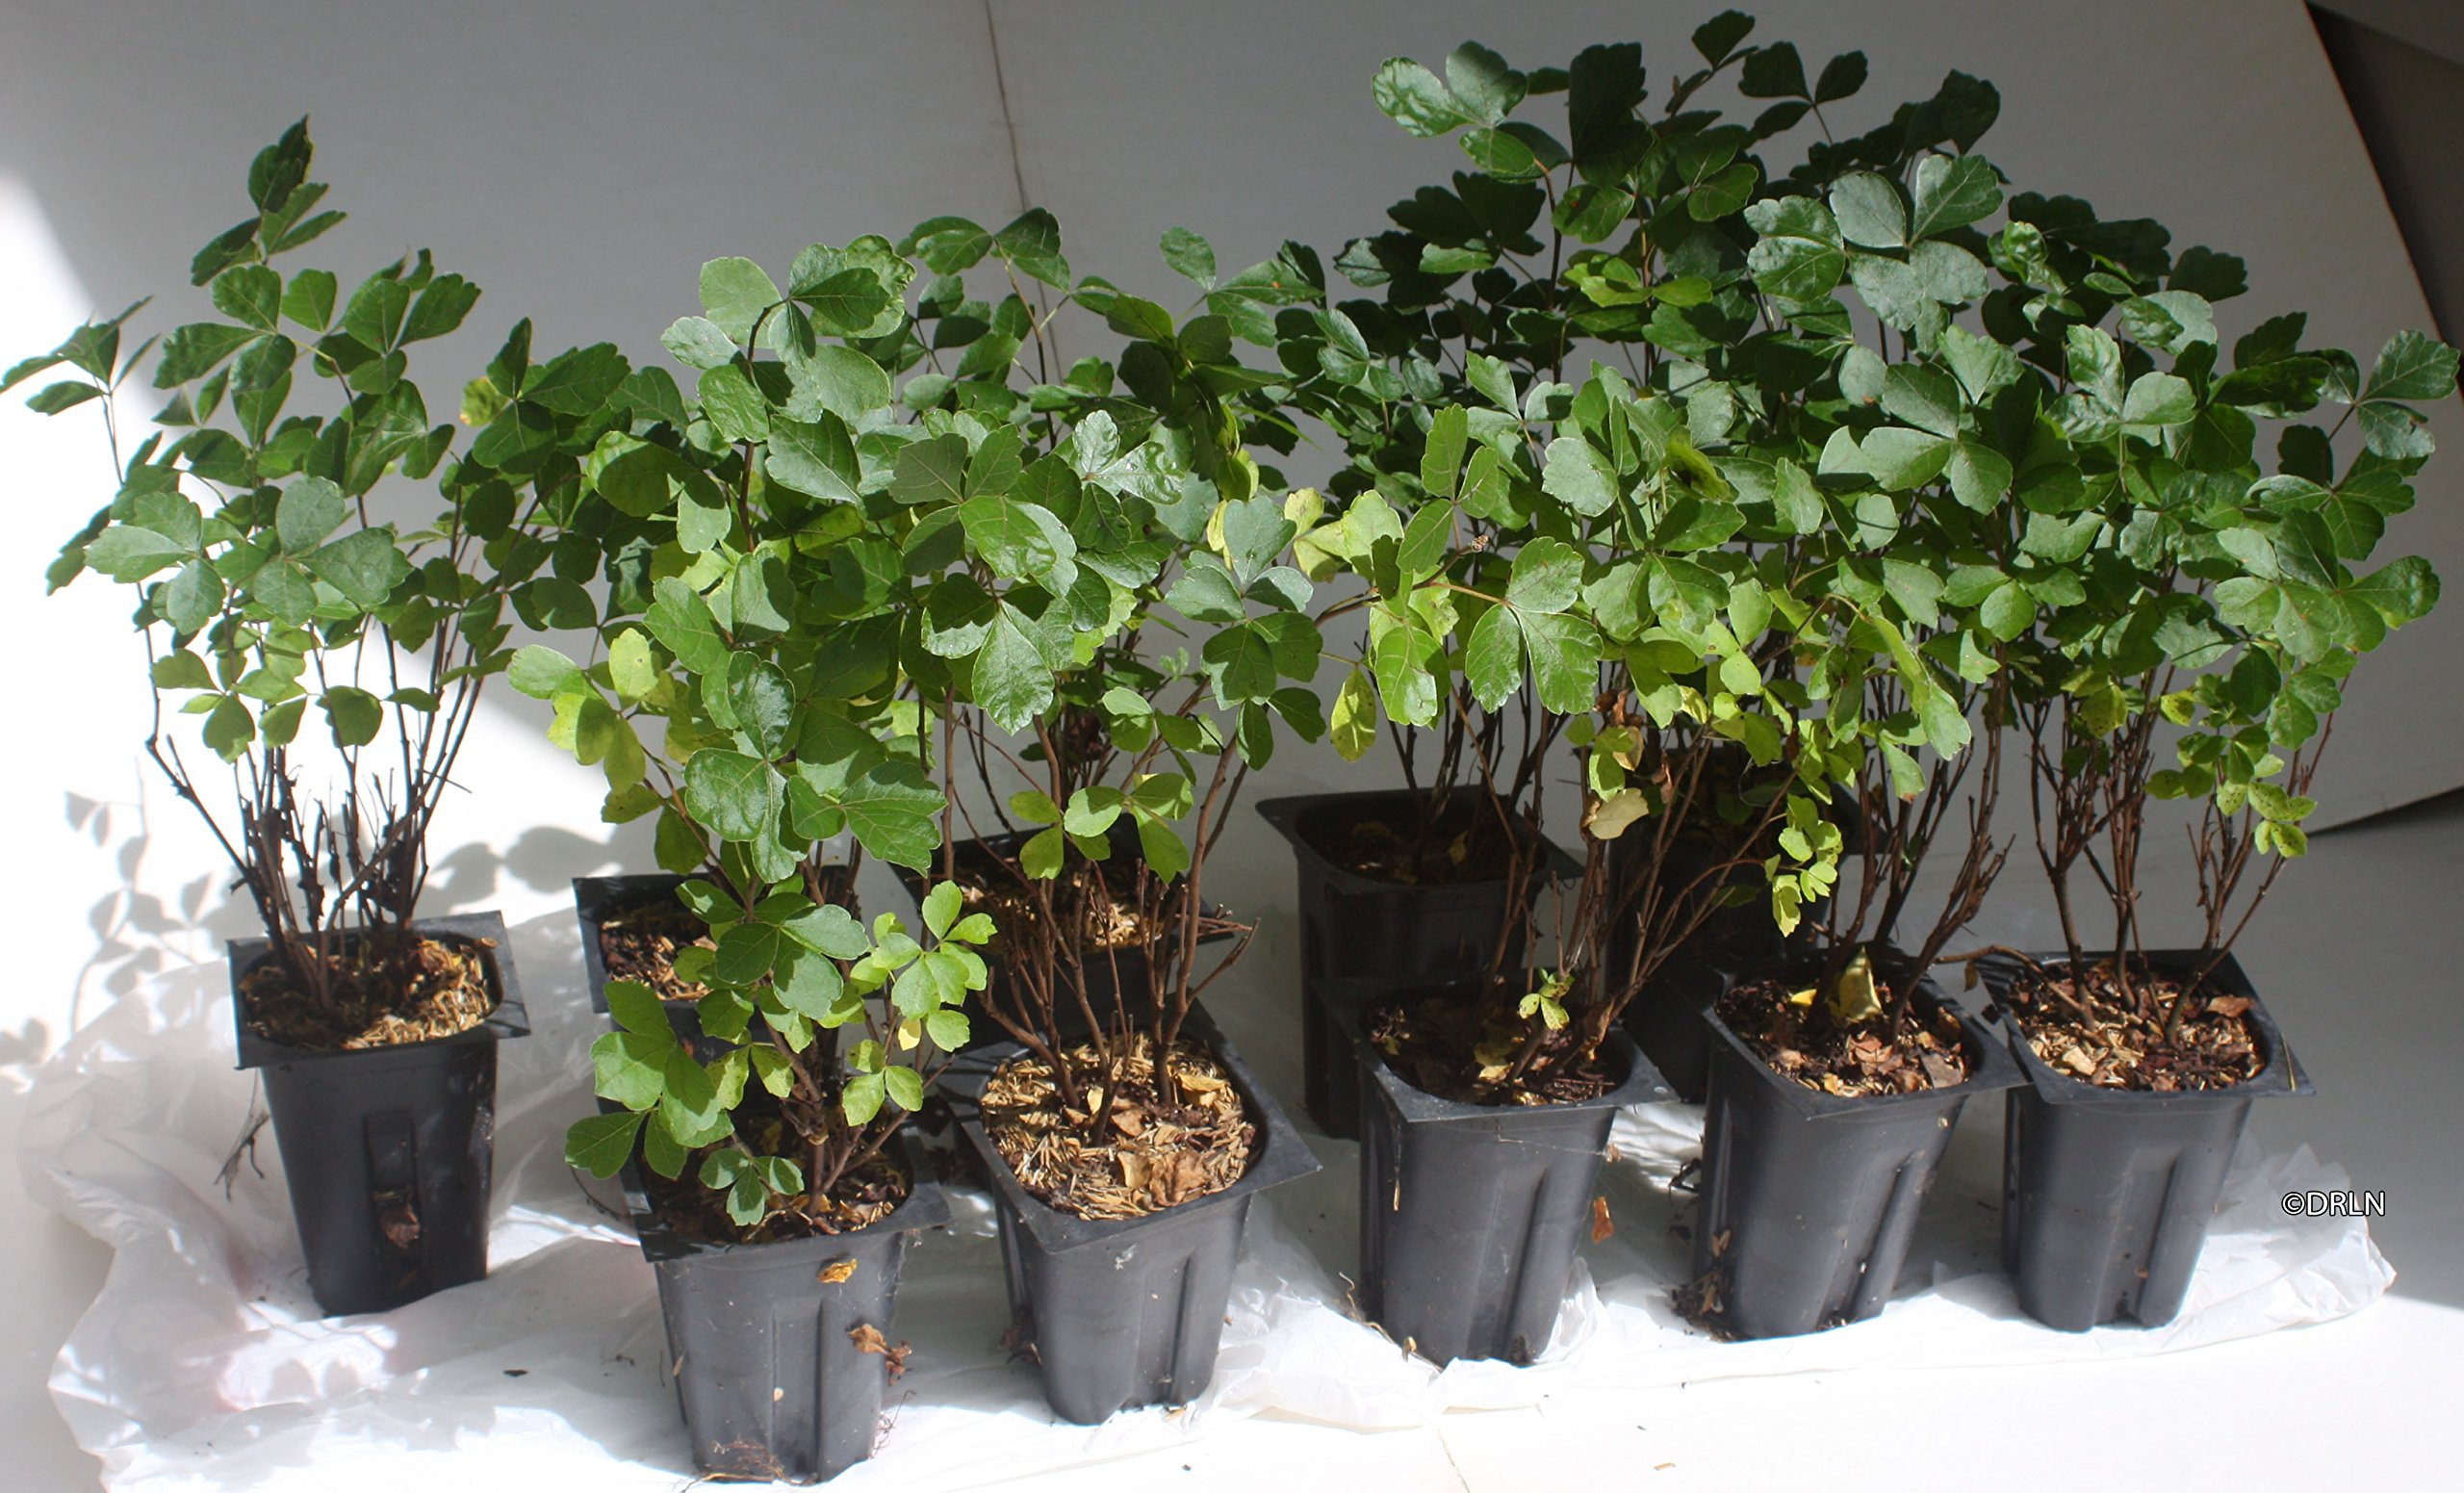 Rhus aromatica Gro-Low Package of 10 plants in 4''-deep pots by Deer-resistant Landscape Nursery